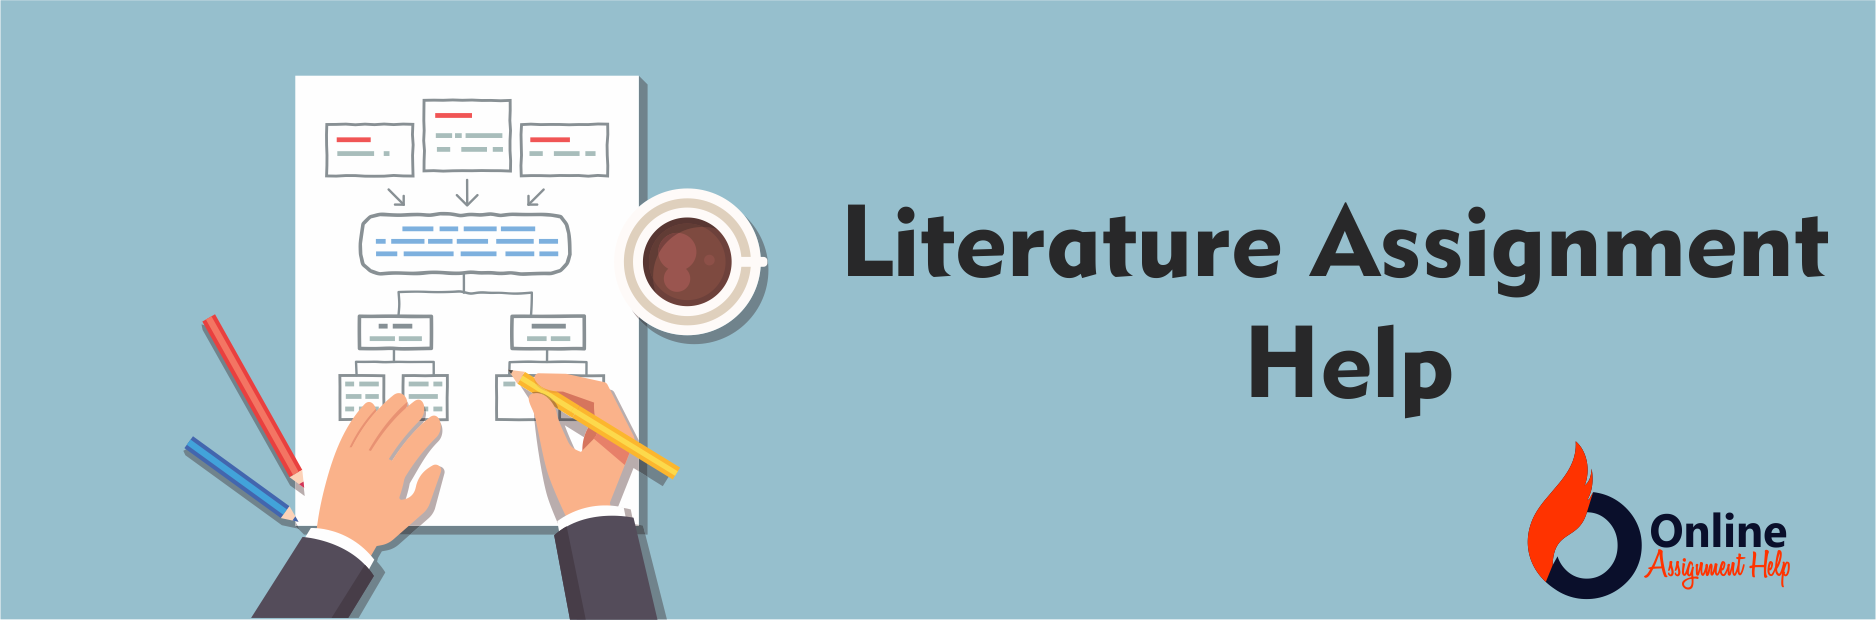 Literature Assignment Help